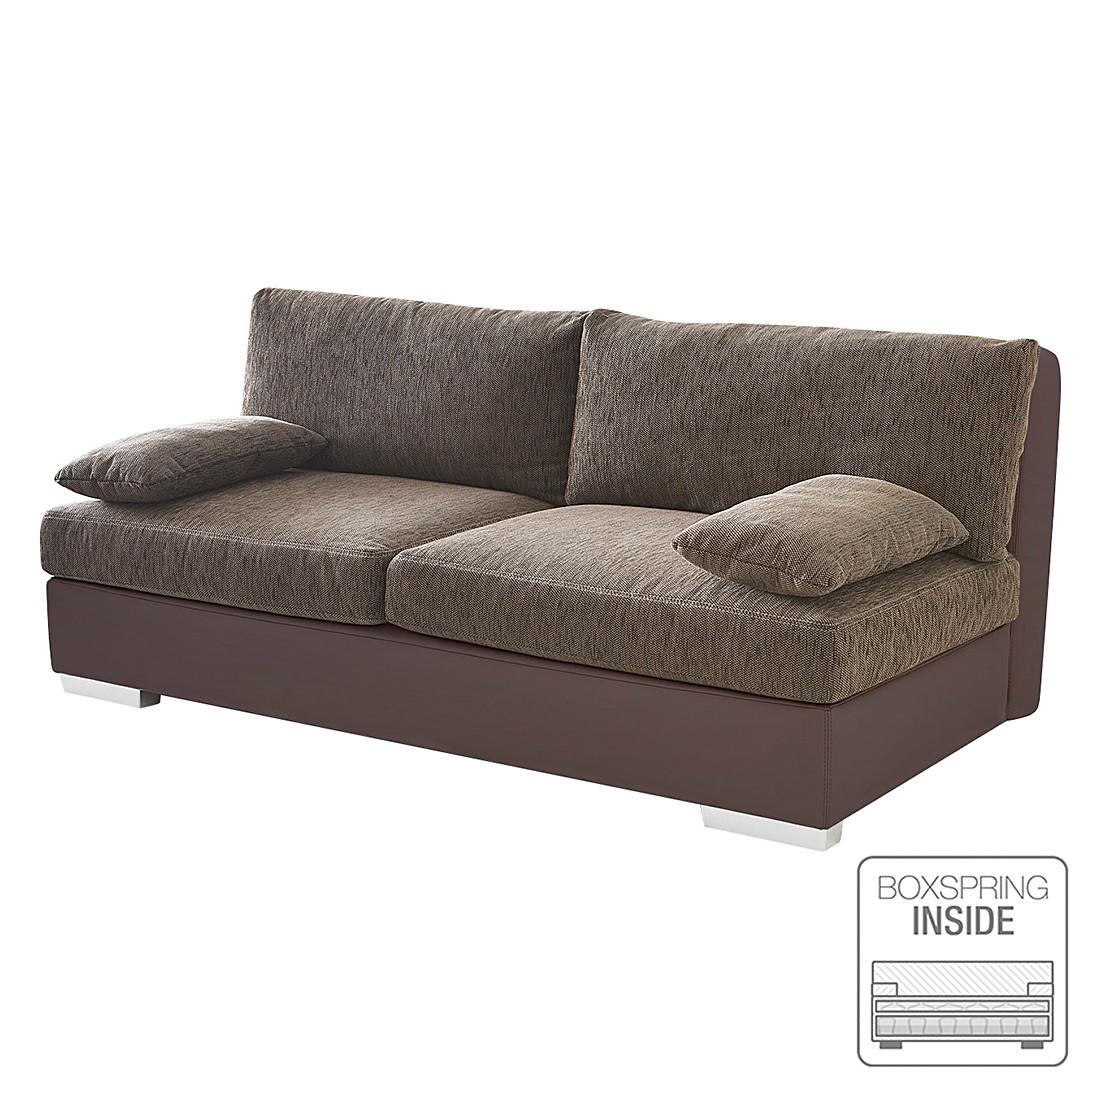 schlafsofas online kaufen. Black Bedroom Furniture Sets. Home Design Ideas